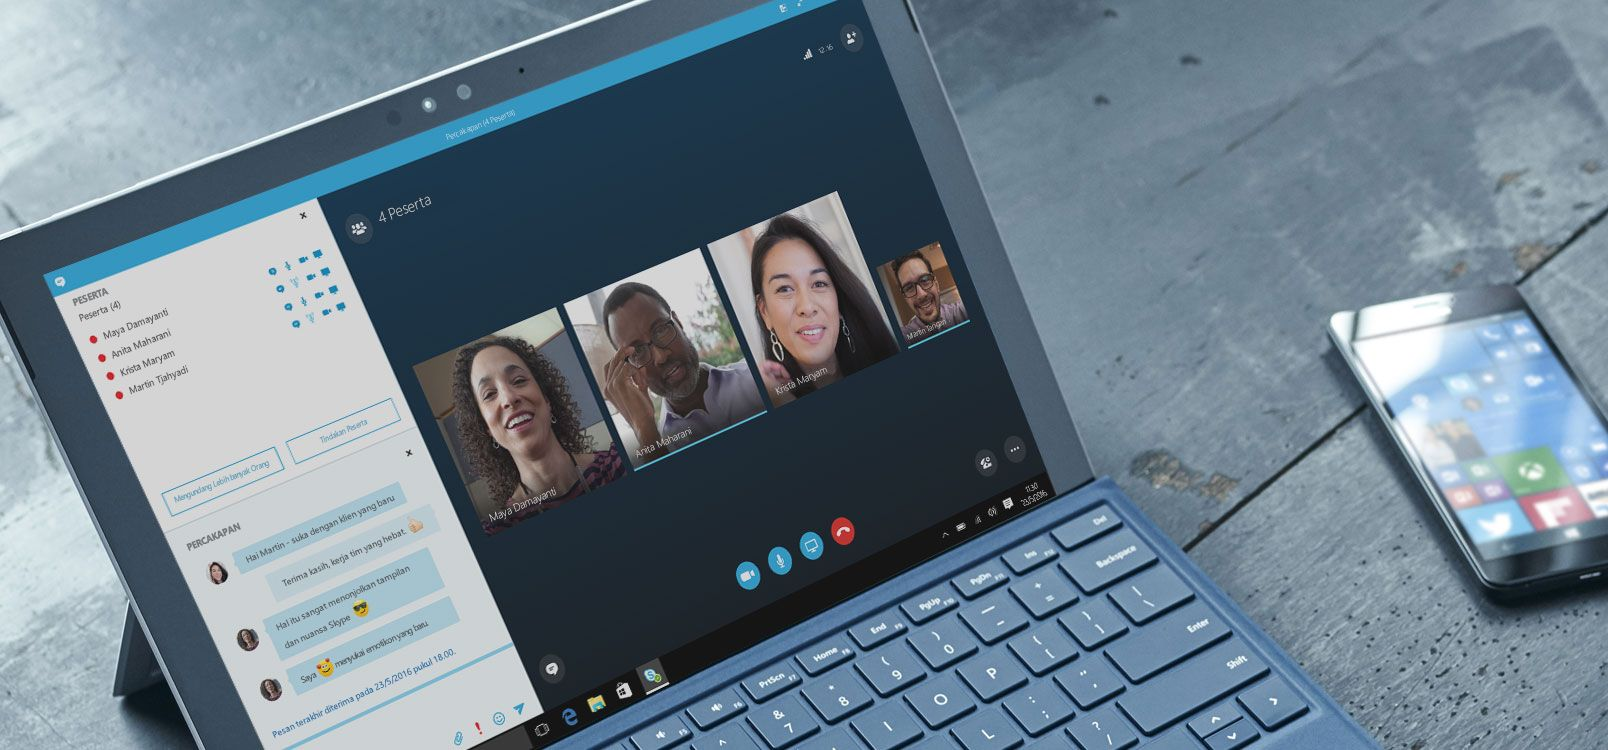 Seorang wanita menggunakan Office 365 di tablet dan smartphone untuk bekerja sama pada dokumen.